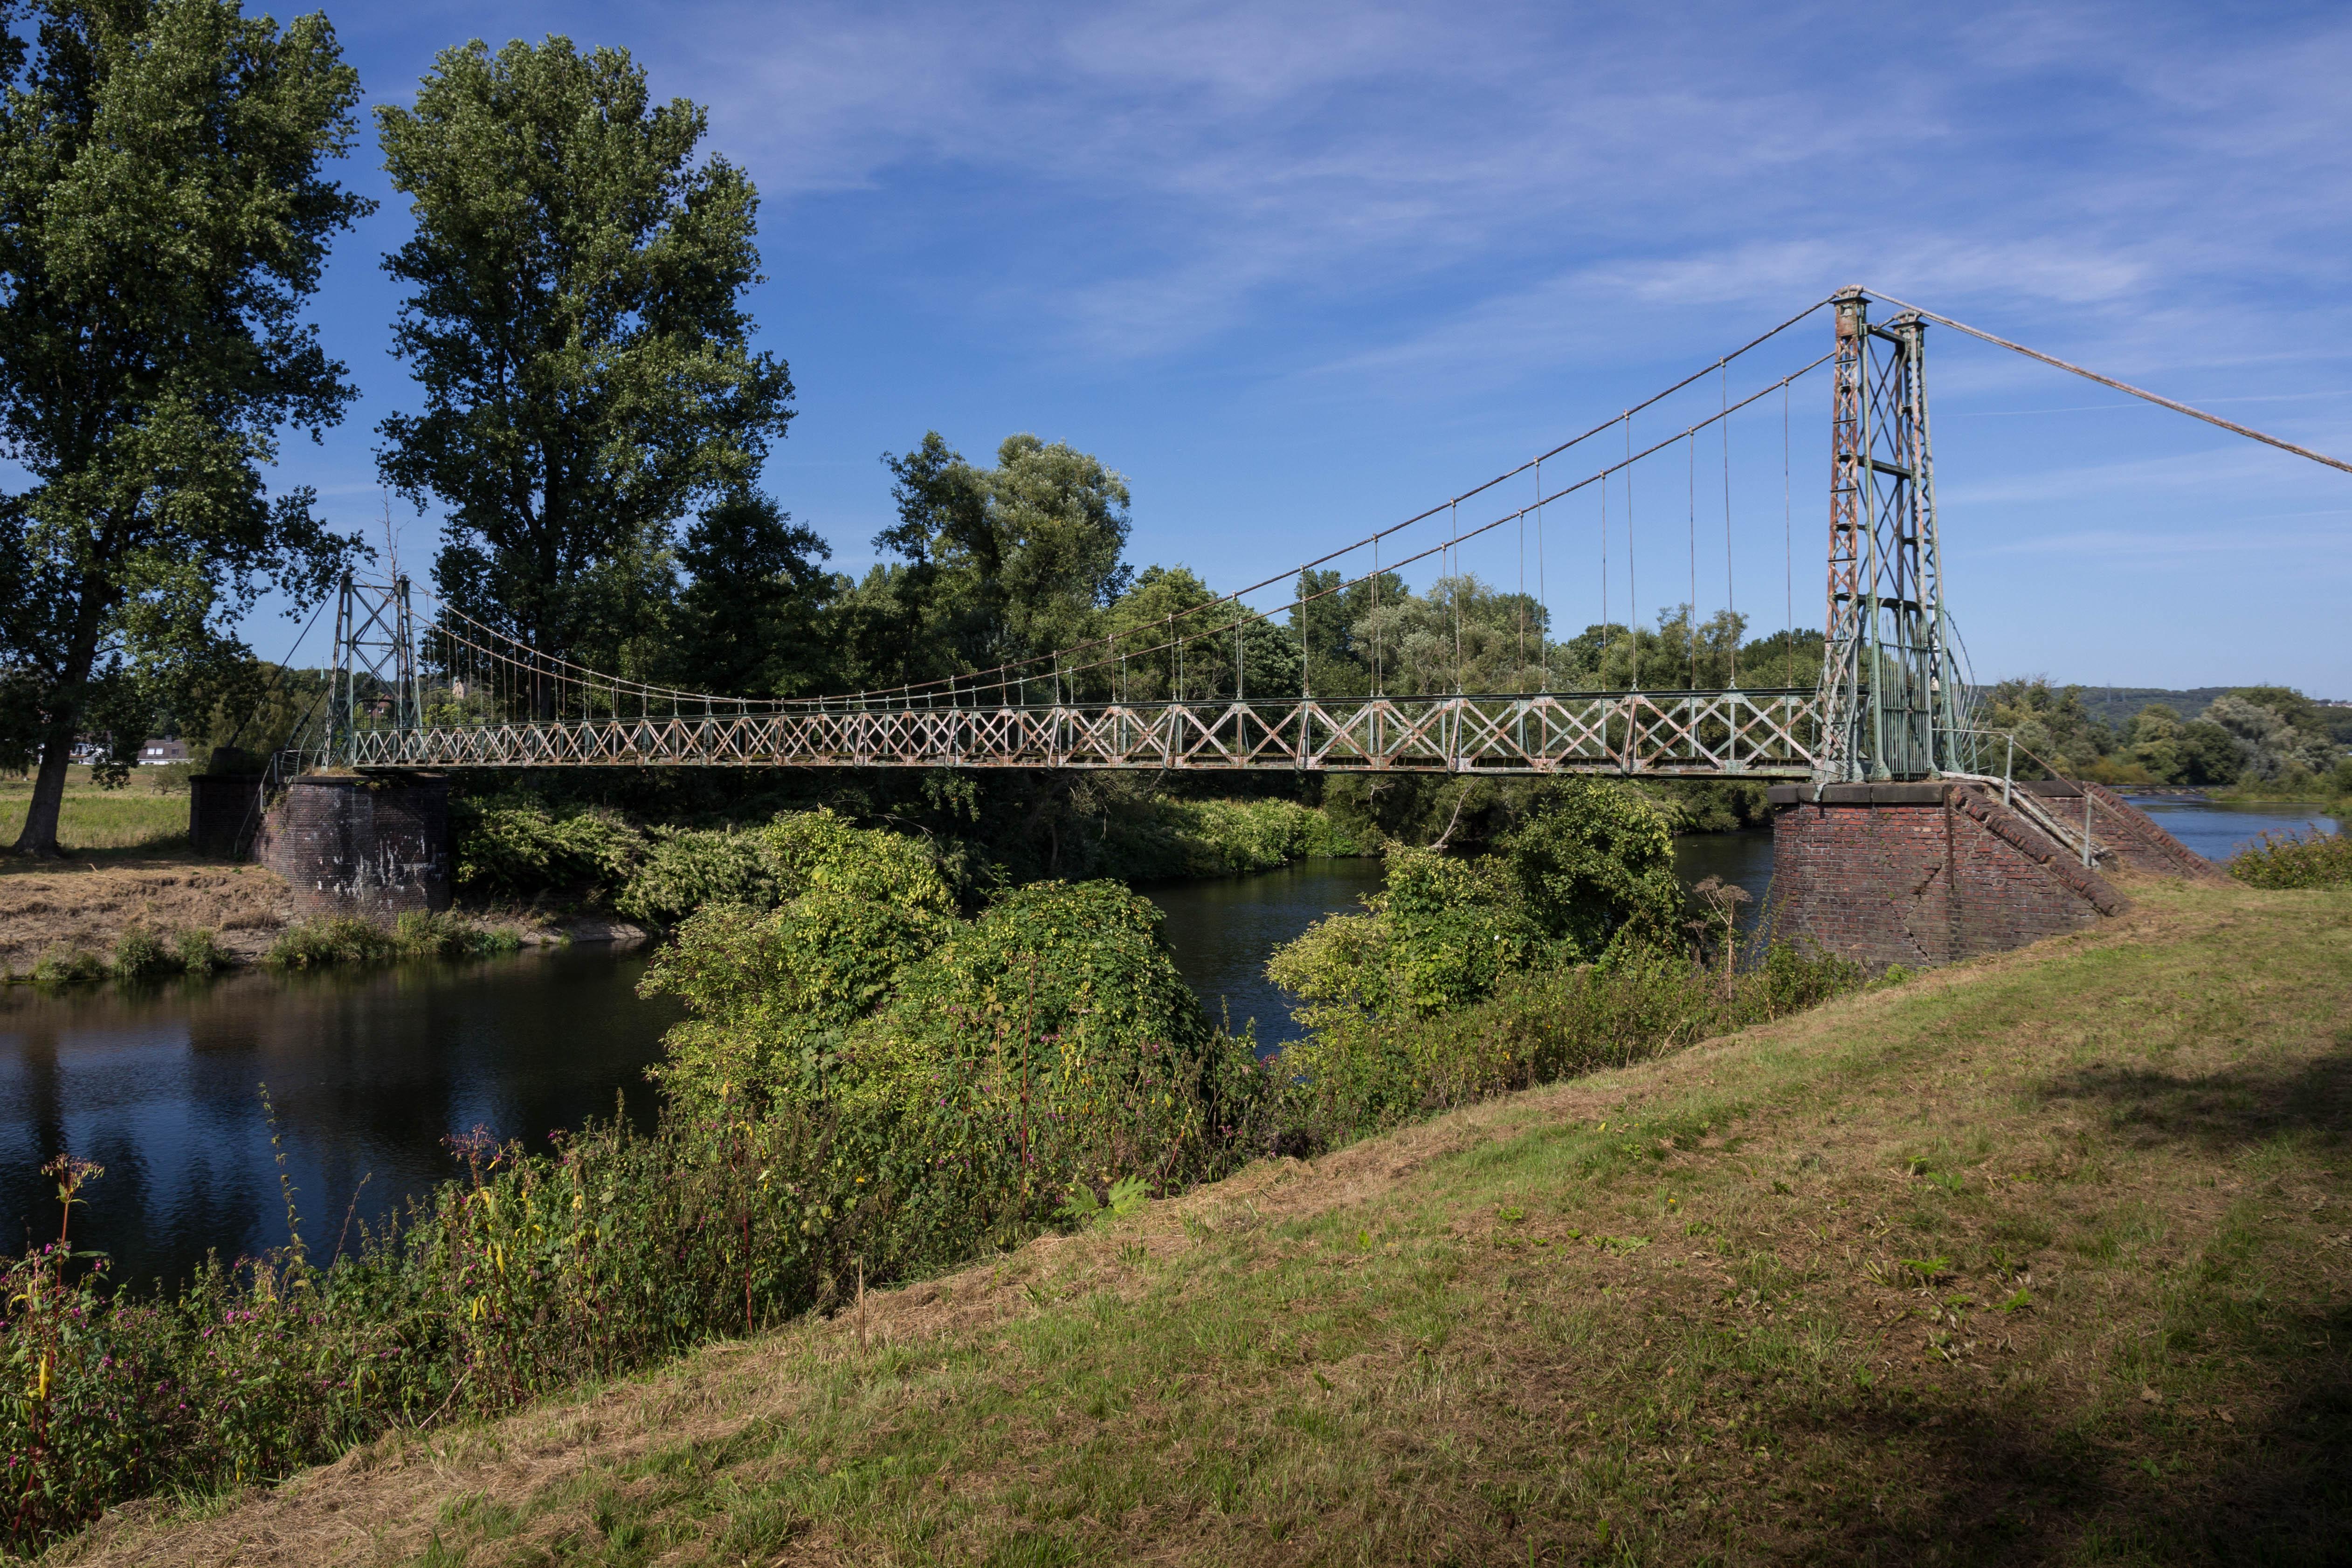 Seilhängebrücke Wetter